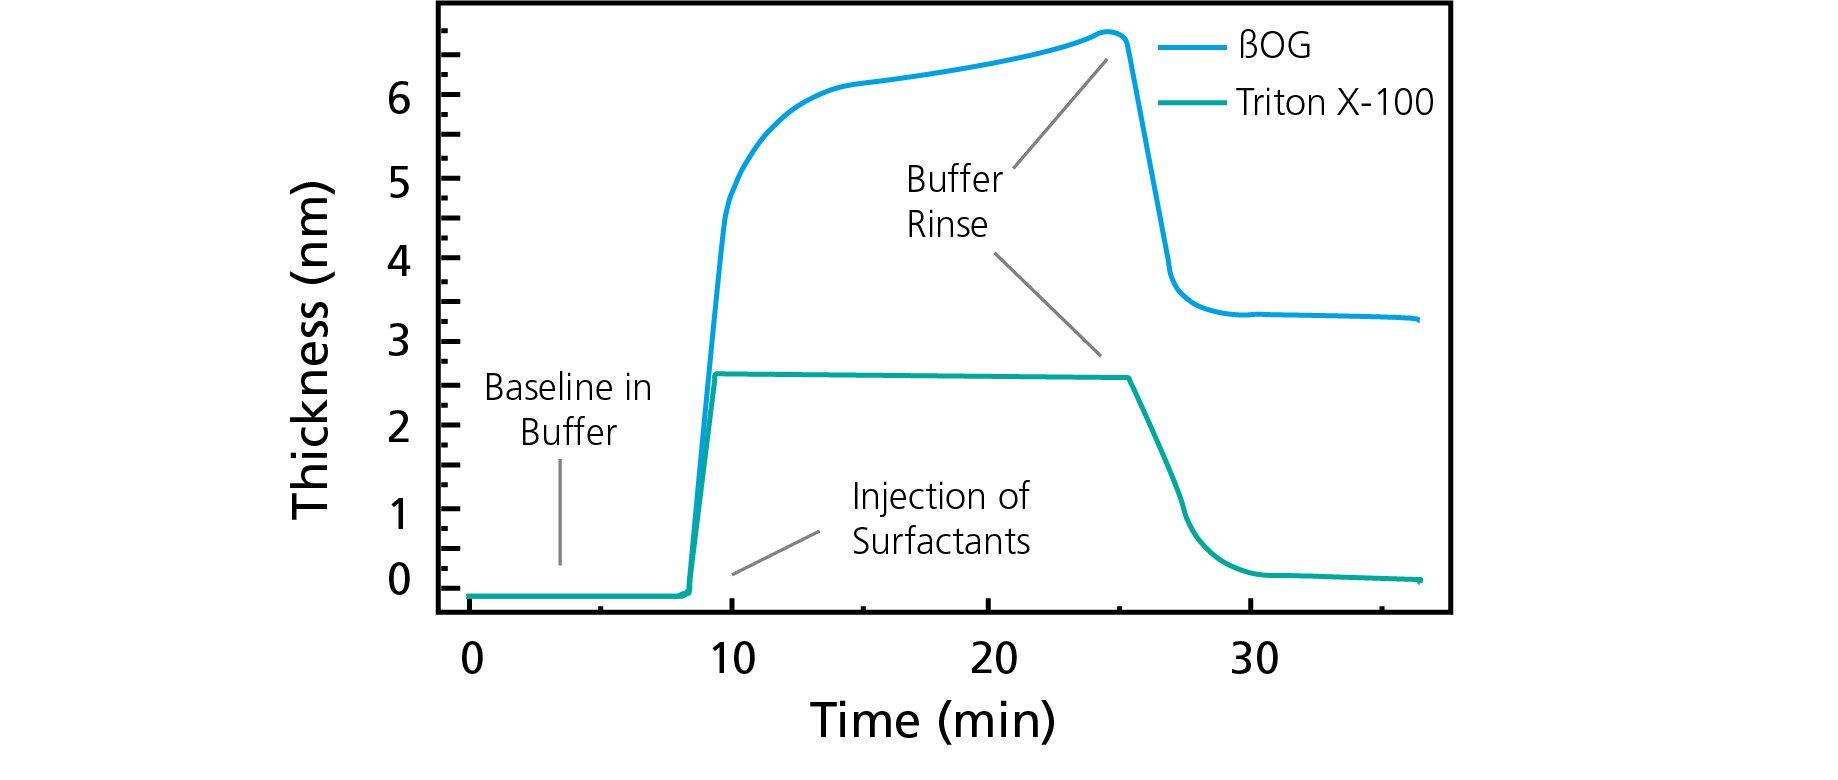 Surfactant adsorption Triton X-100 vs BOG